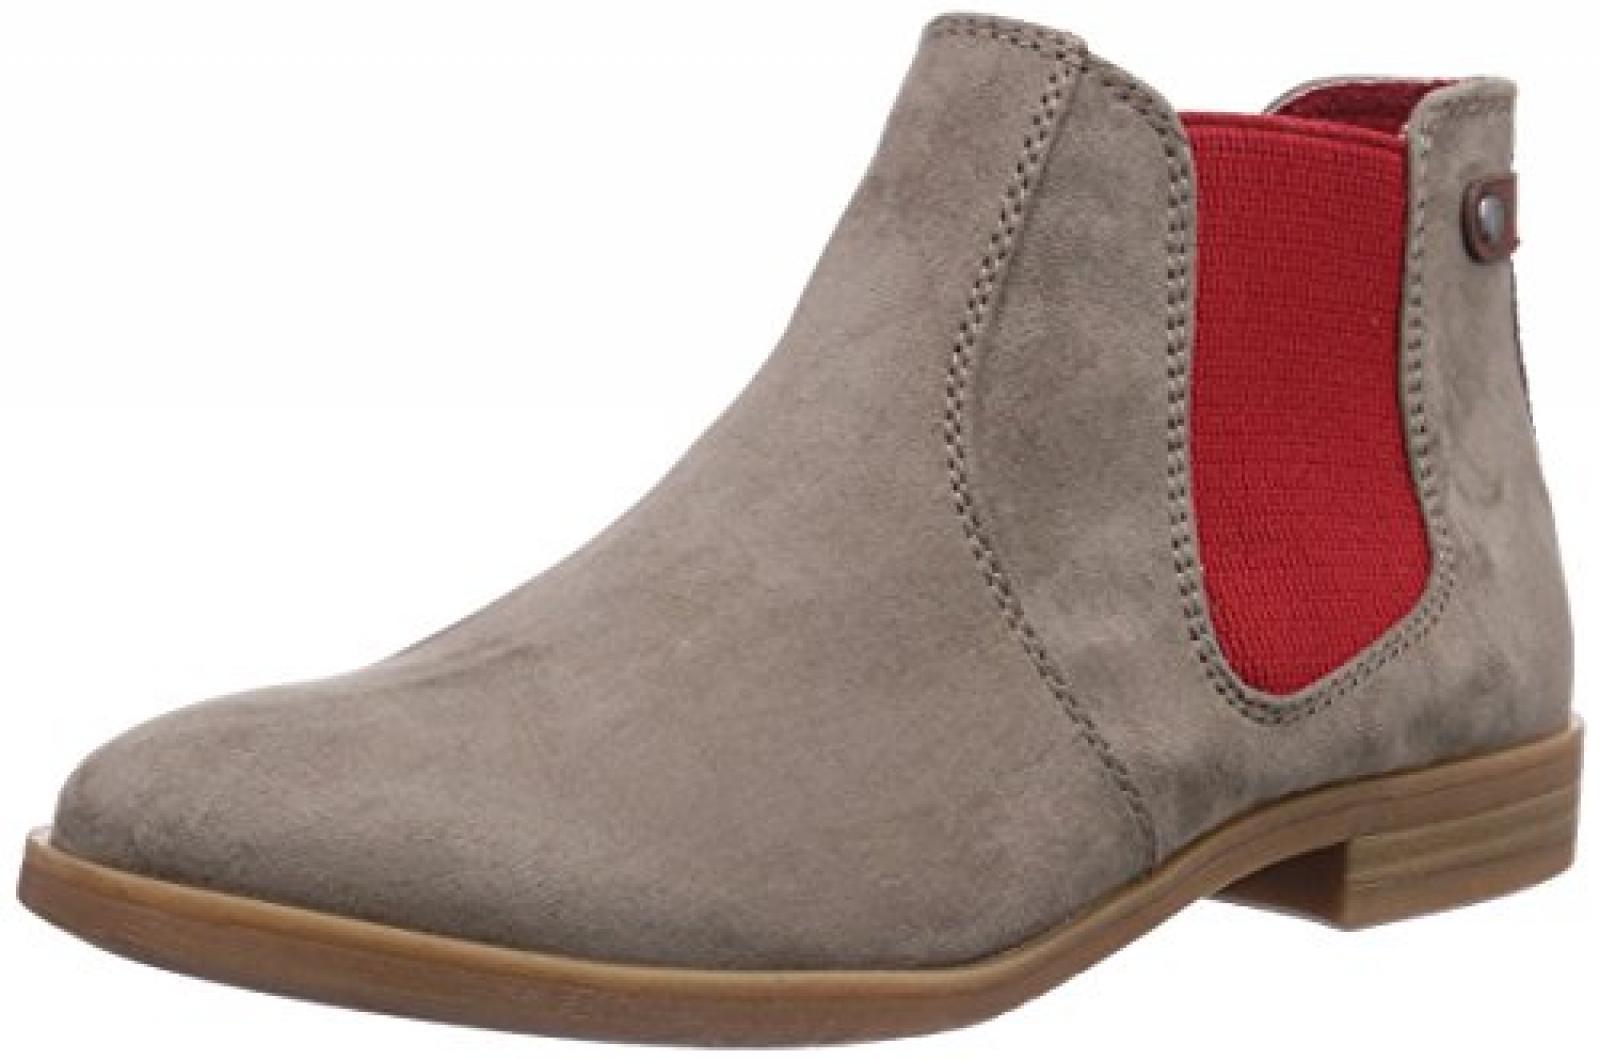 s.Oliver 25302 Damen Chelsea Boots